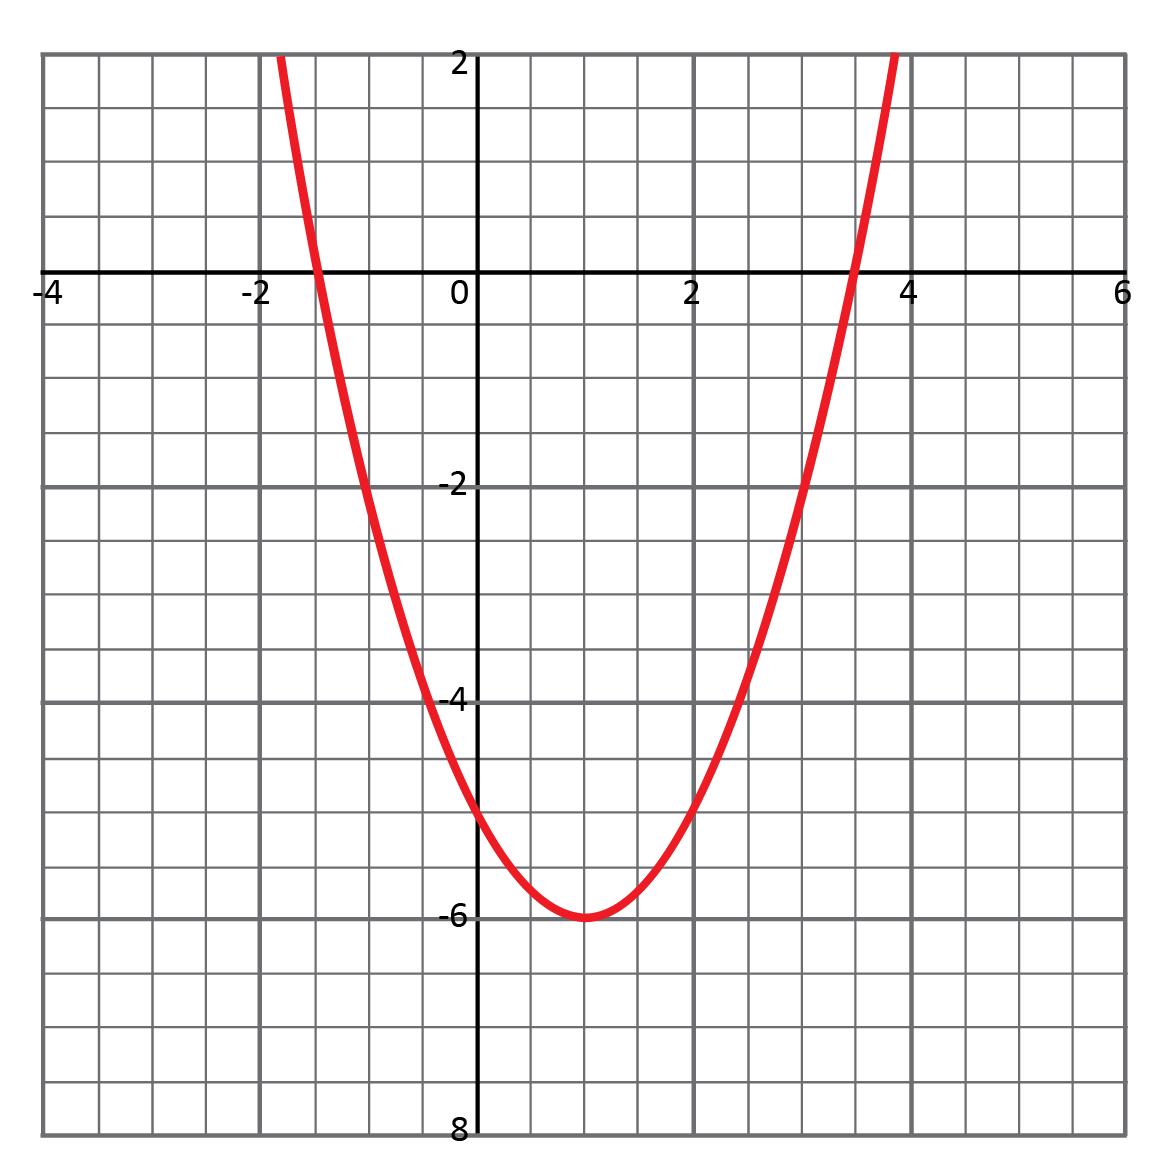 coordinate grid, graph of a parabola, x-intercepts at x equals negative 1.5 and x equals 1.5, vertex at (1, negative 6)